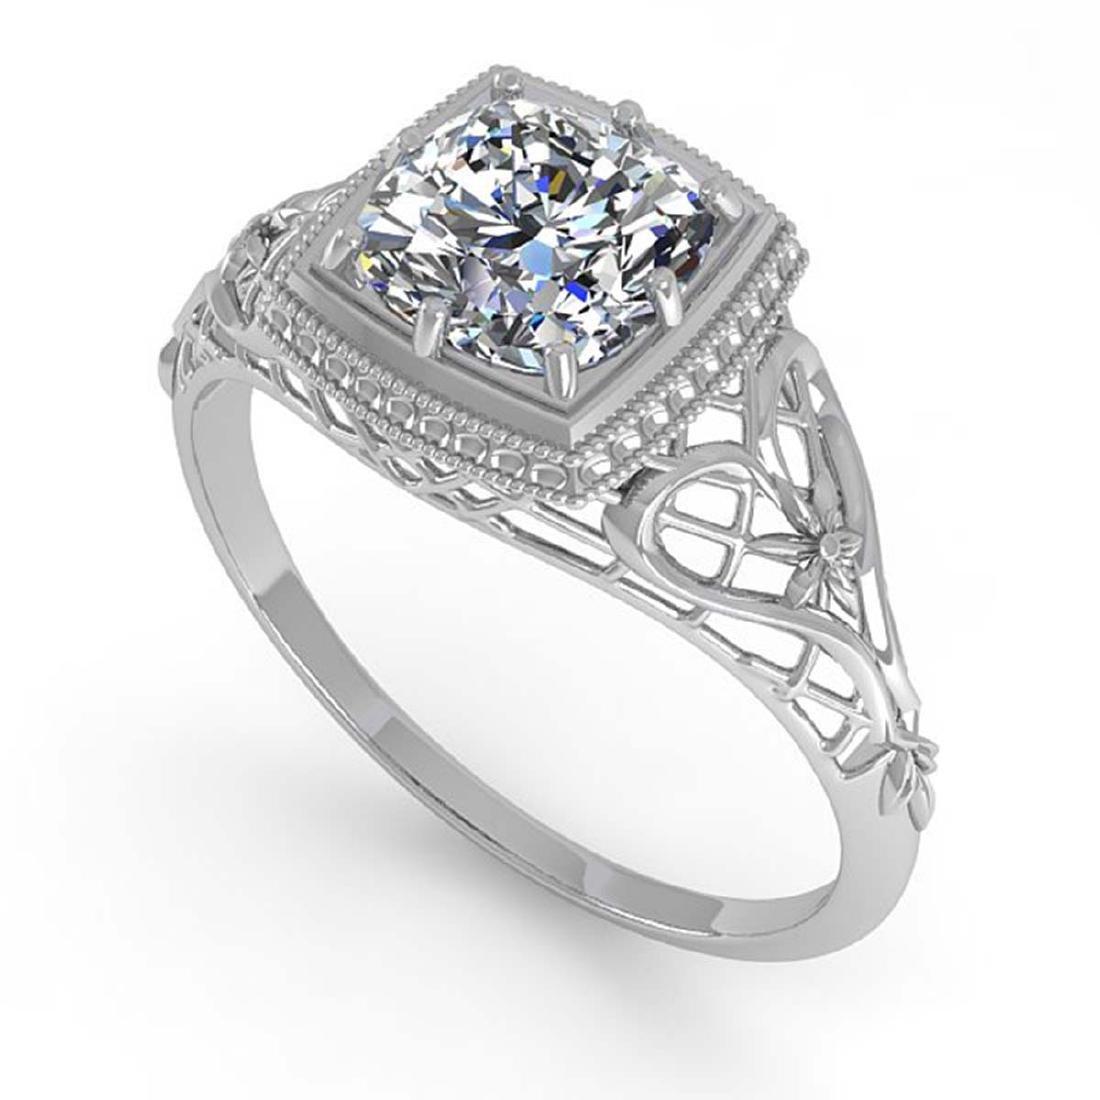 1.0 CTW Certified VS/SI Cushion Diamond Ring Art Deco - 2